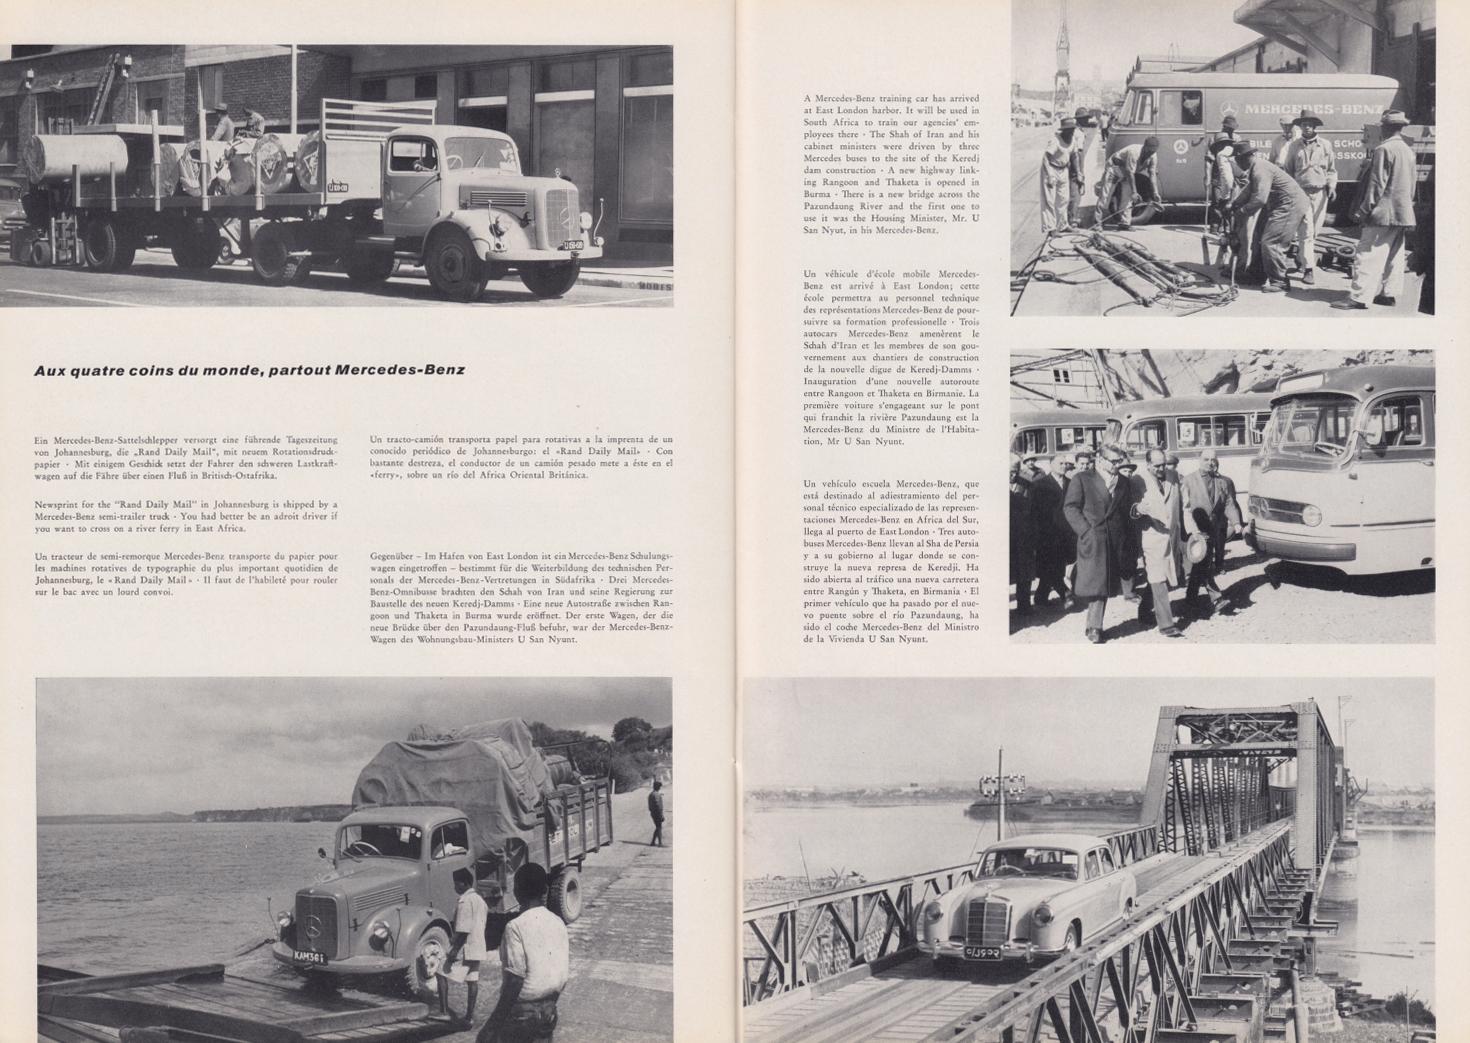 (REVISTA): Periódico In aller welt n.º 33 - Mercedes-Benz no mundo - 1959 - multilingue 013